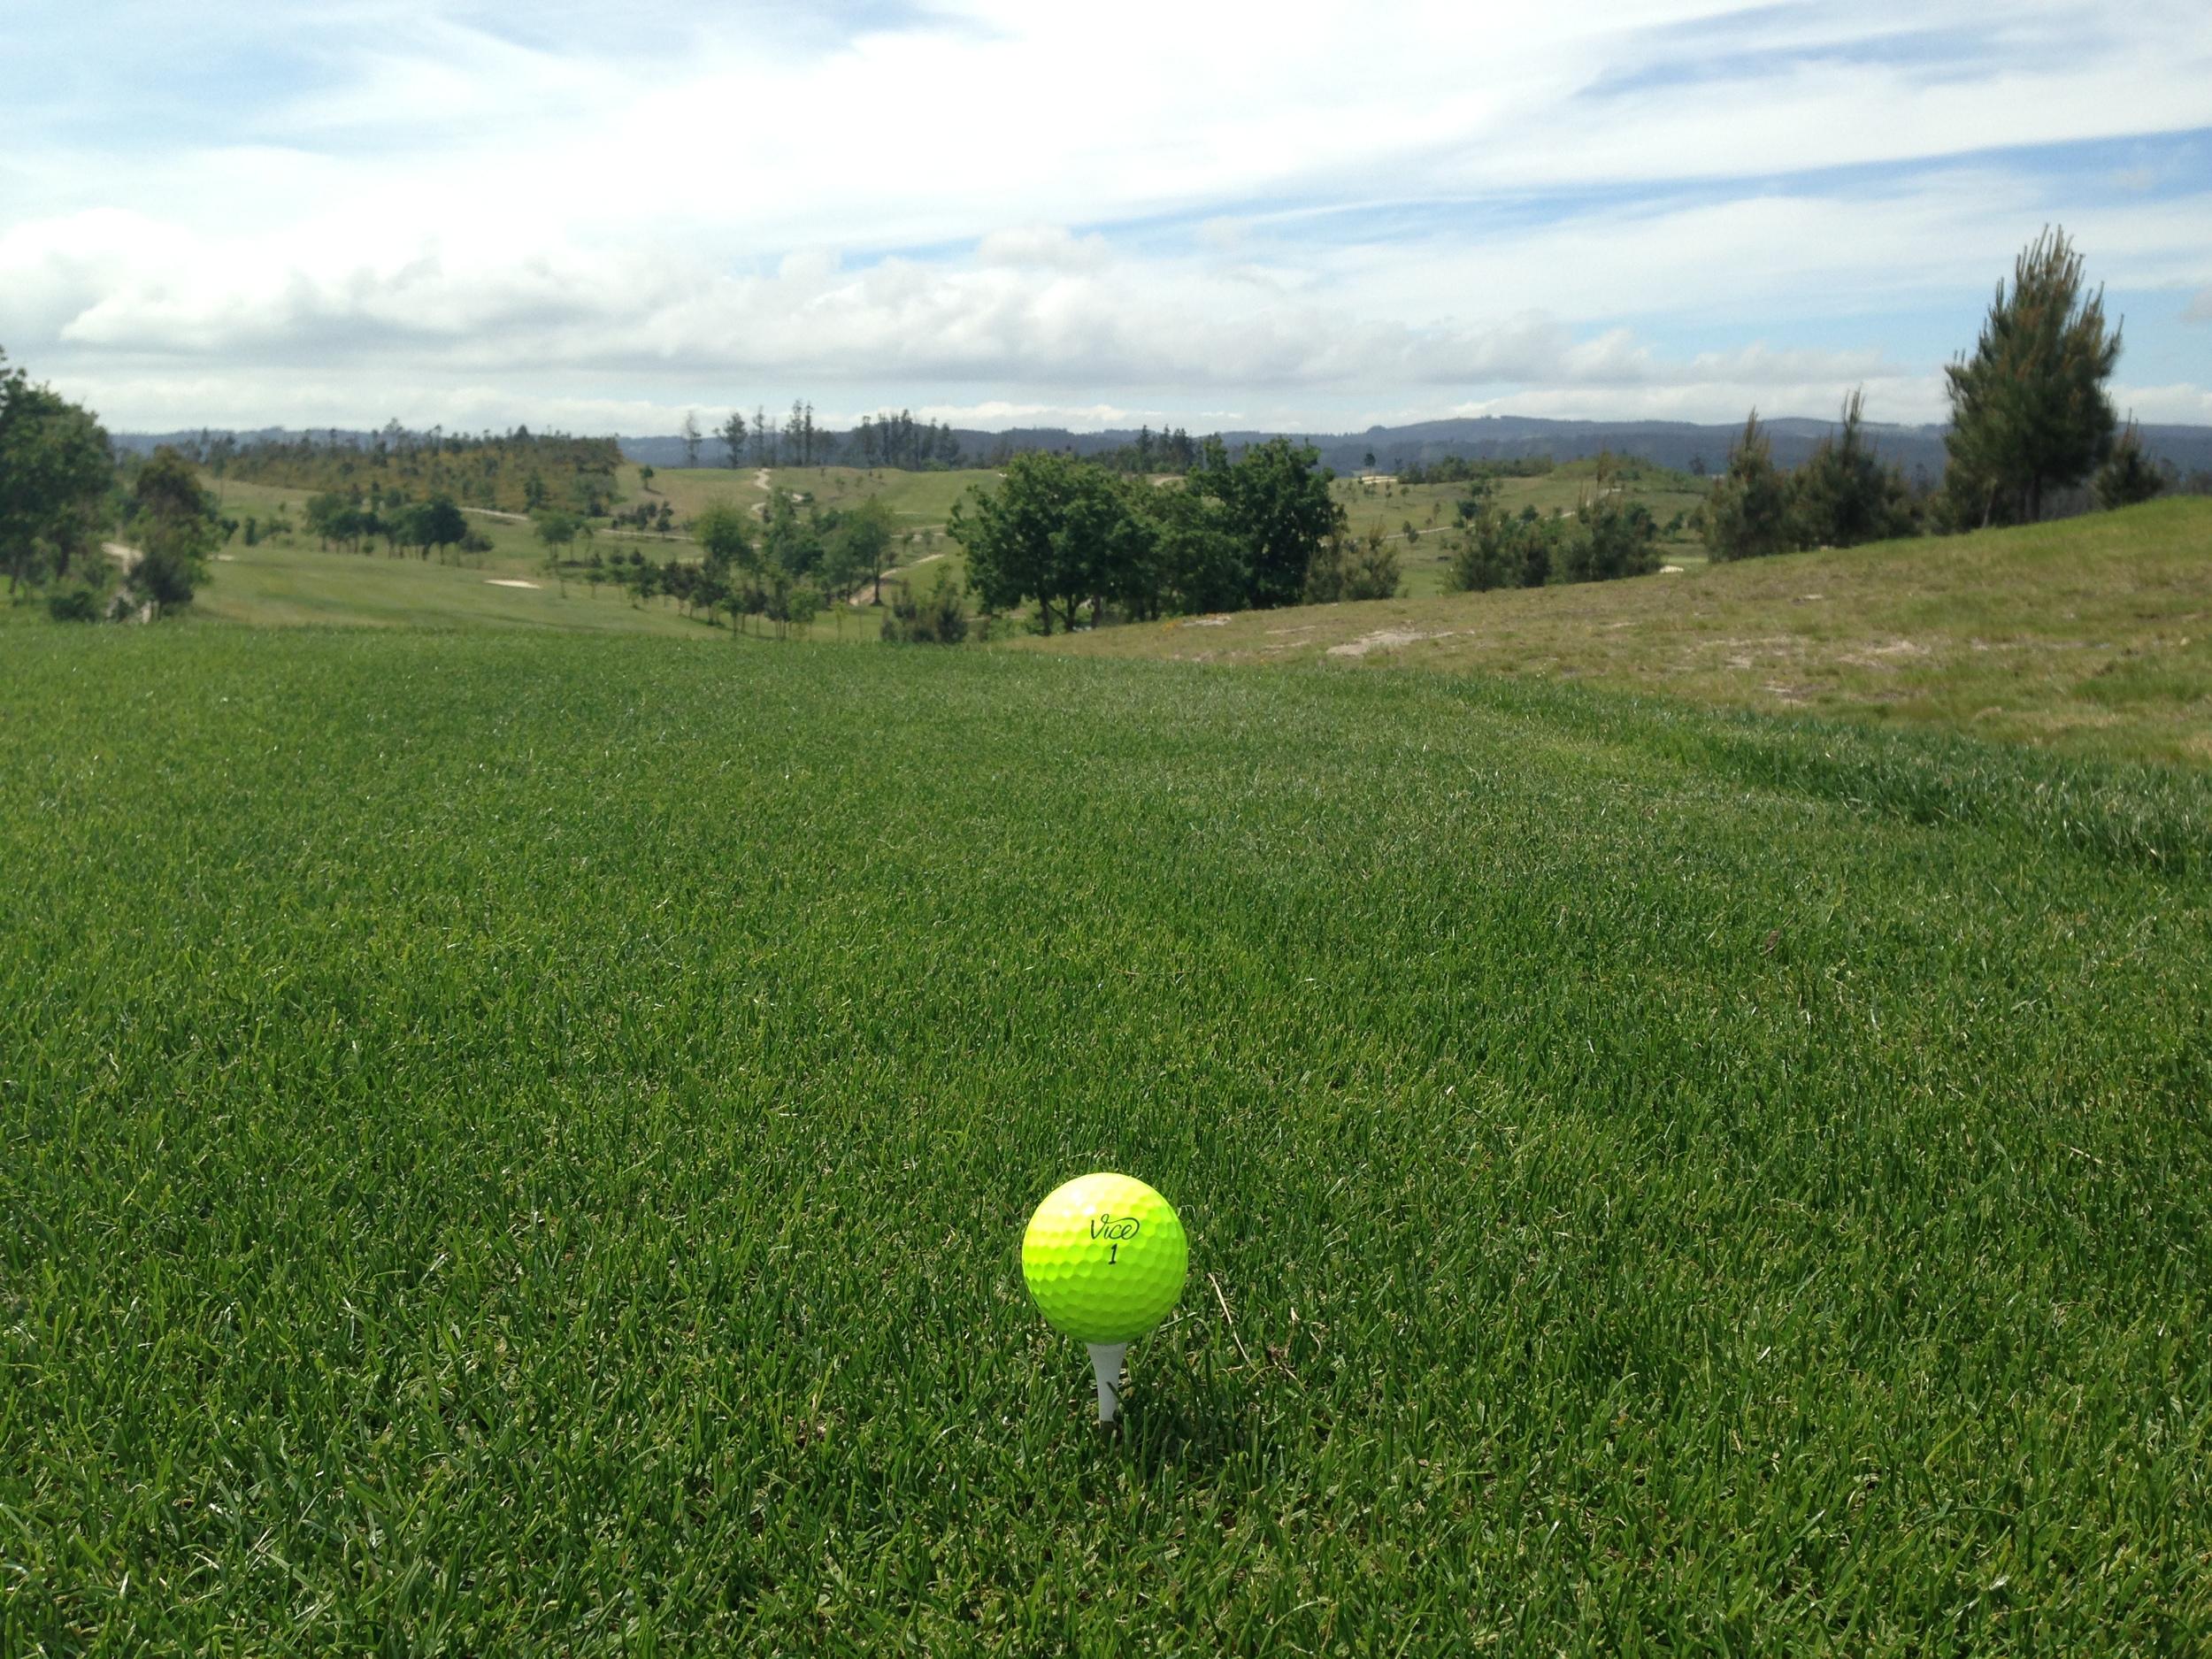 Vice Golf Ball Neon Review Josh Hirst Golf Golf by josh